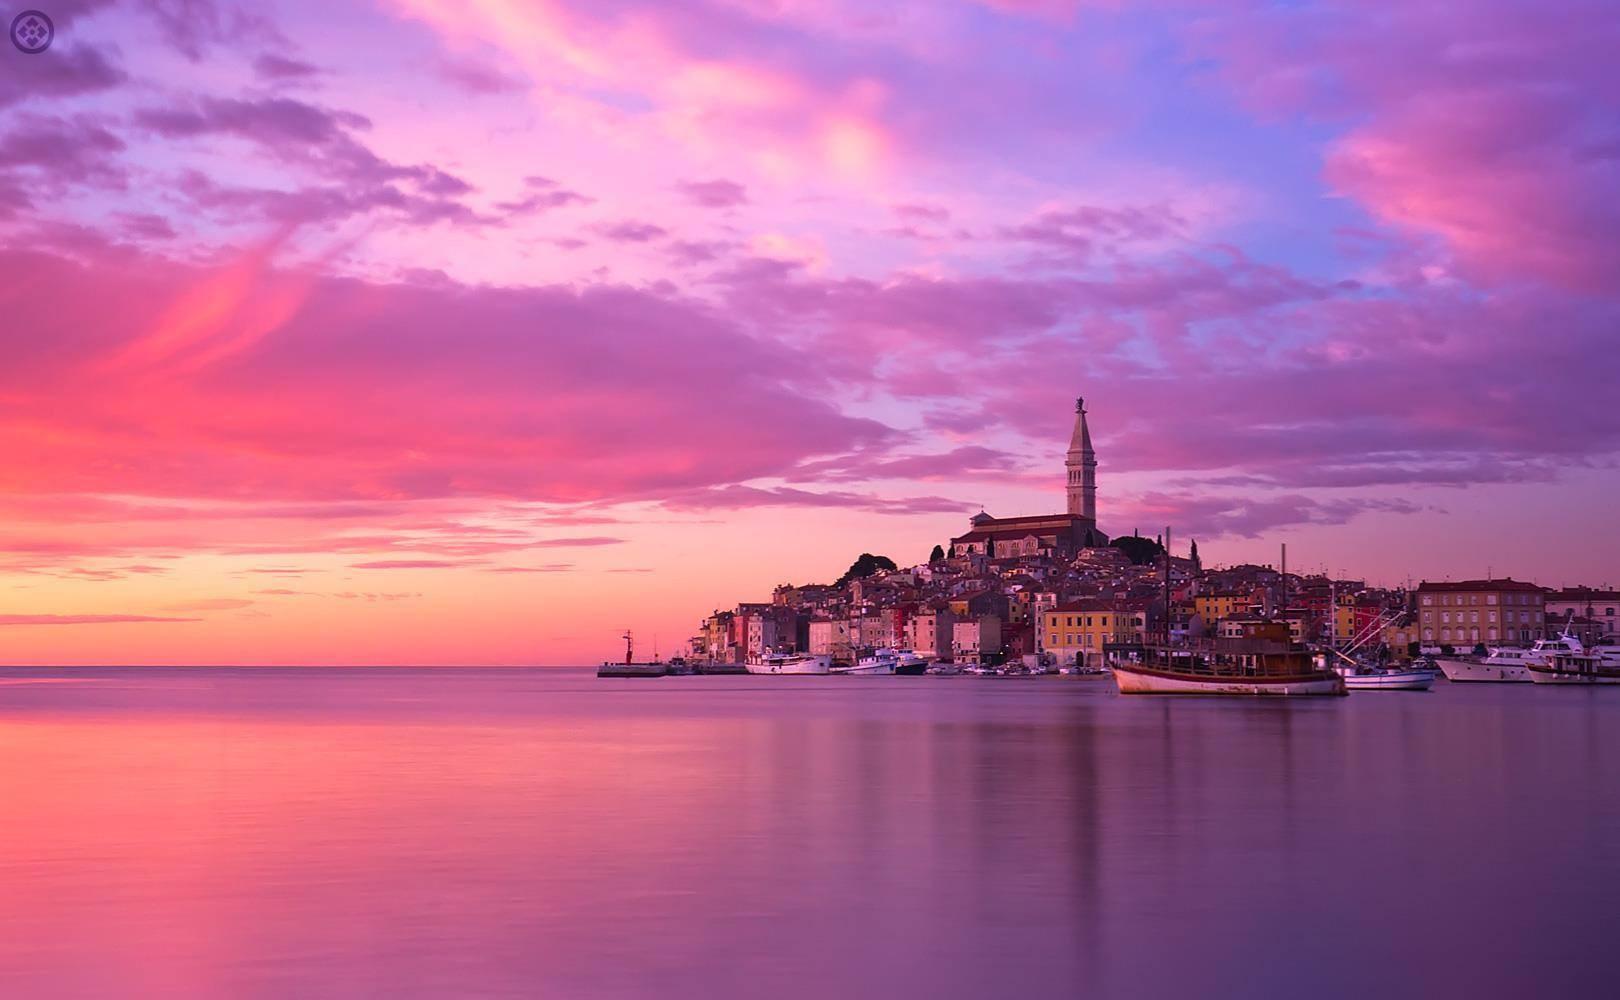 Rovinj la perle de l' Istrie...Must see! Visitez  Rovinj en bateau depuis la riva de Pula...